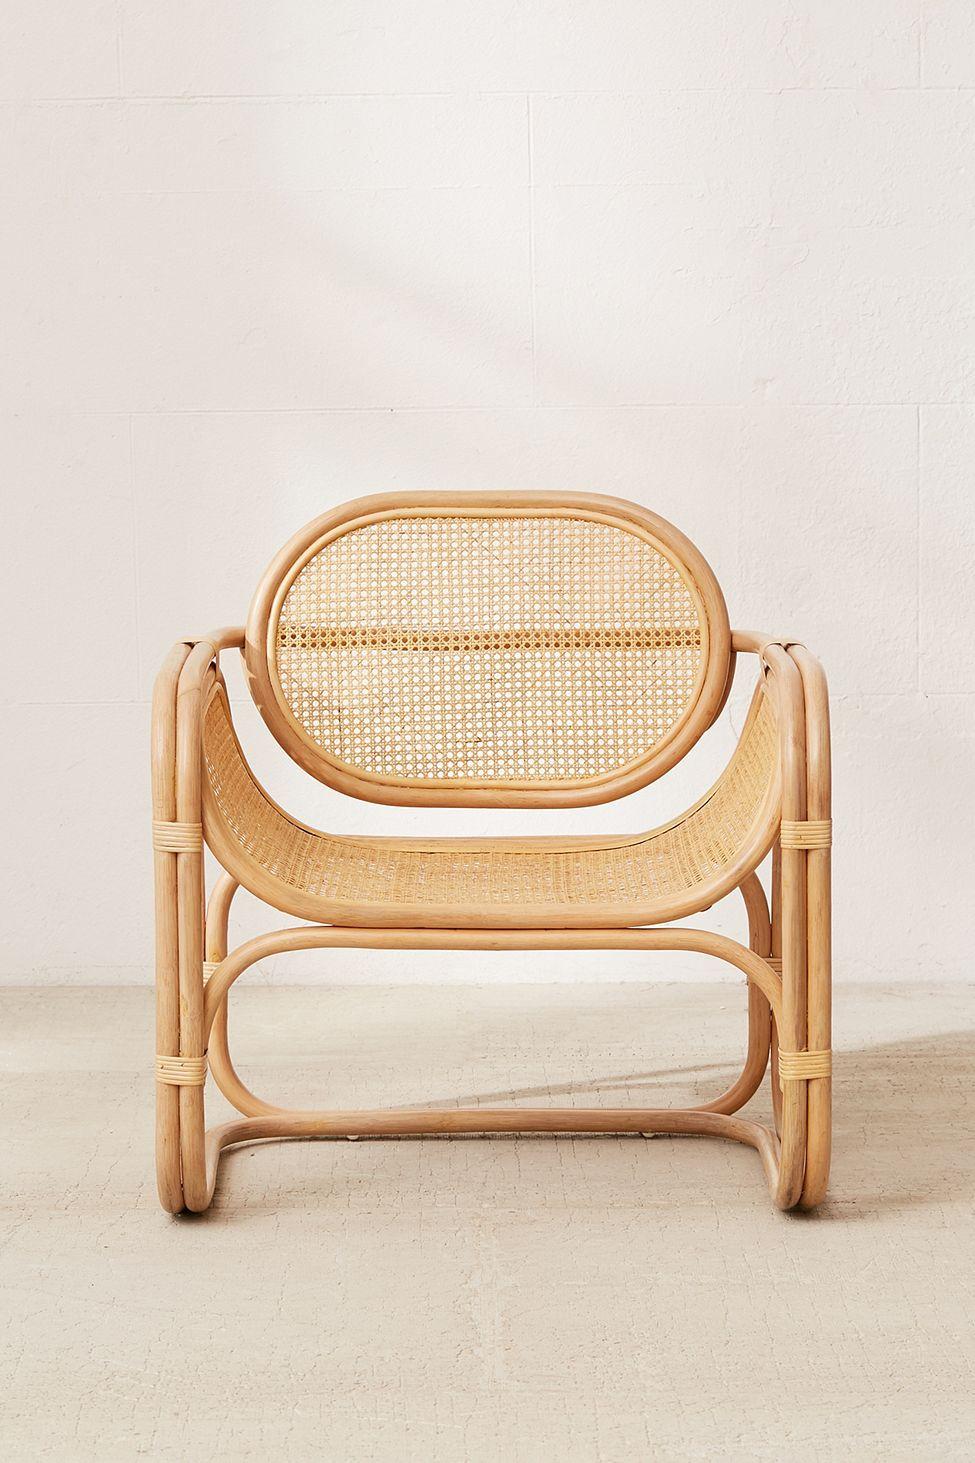 Week Of July 23 2018 Sight Unseen Rattan Lounge Chair Chair Design Furniture Decor